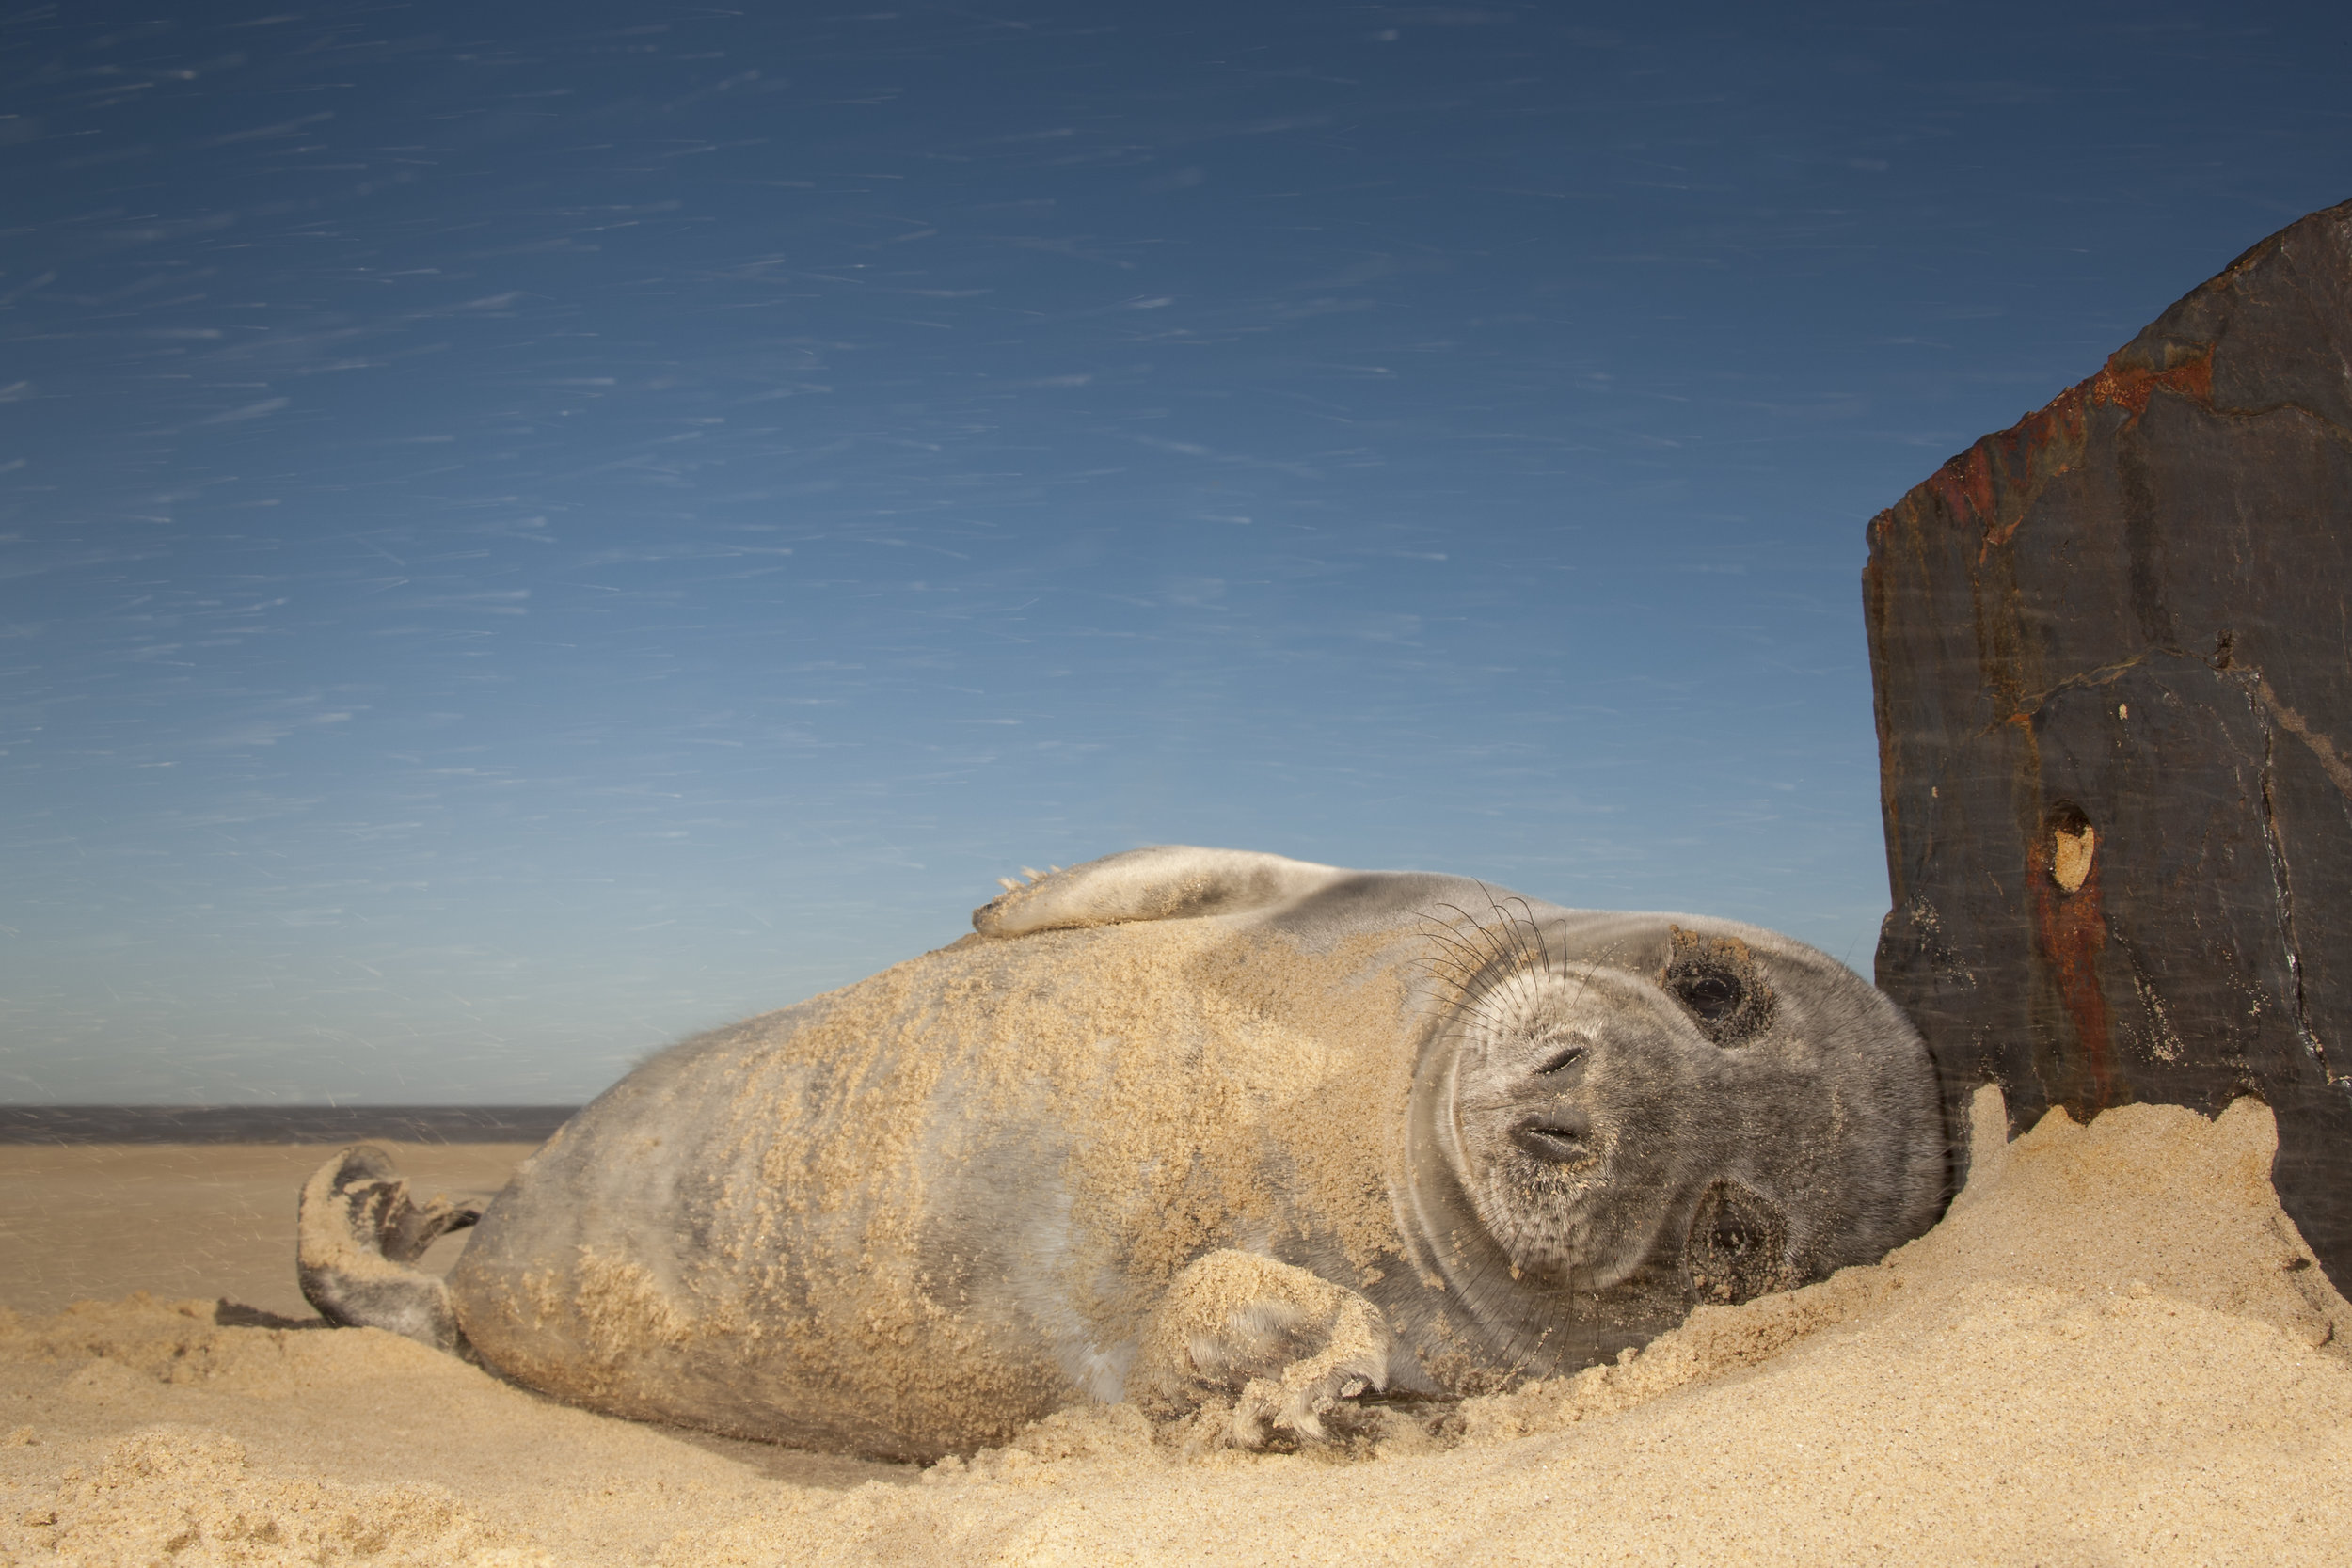 Grey_Seal_Pup_Sandstorm2.jpg